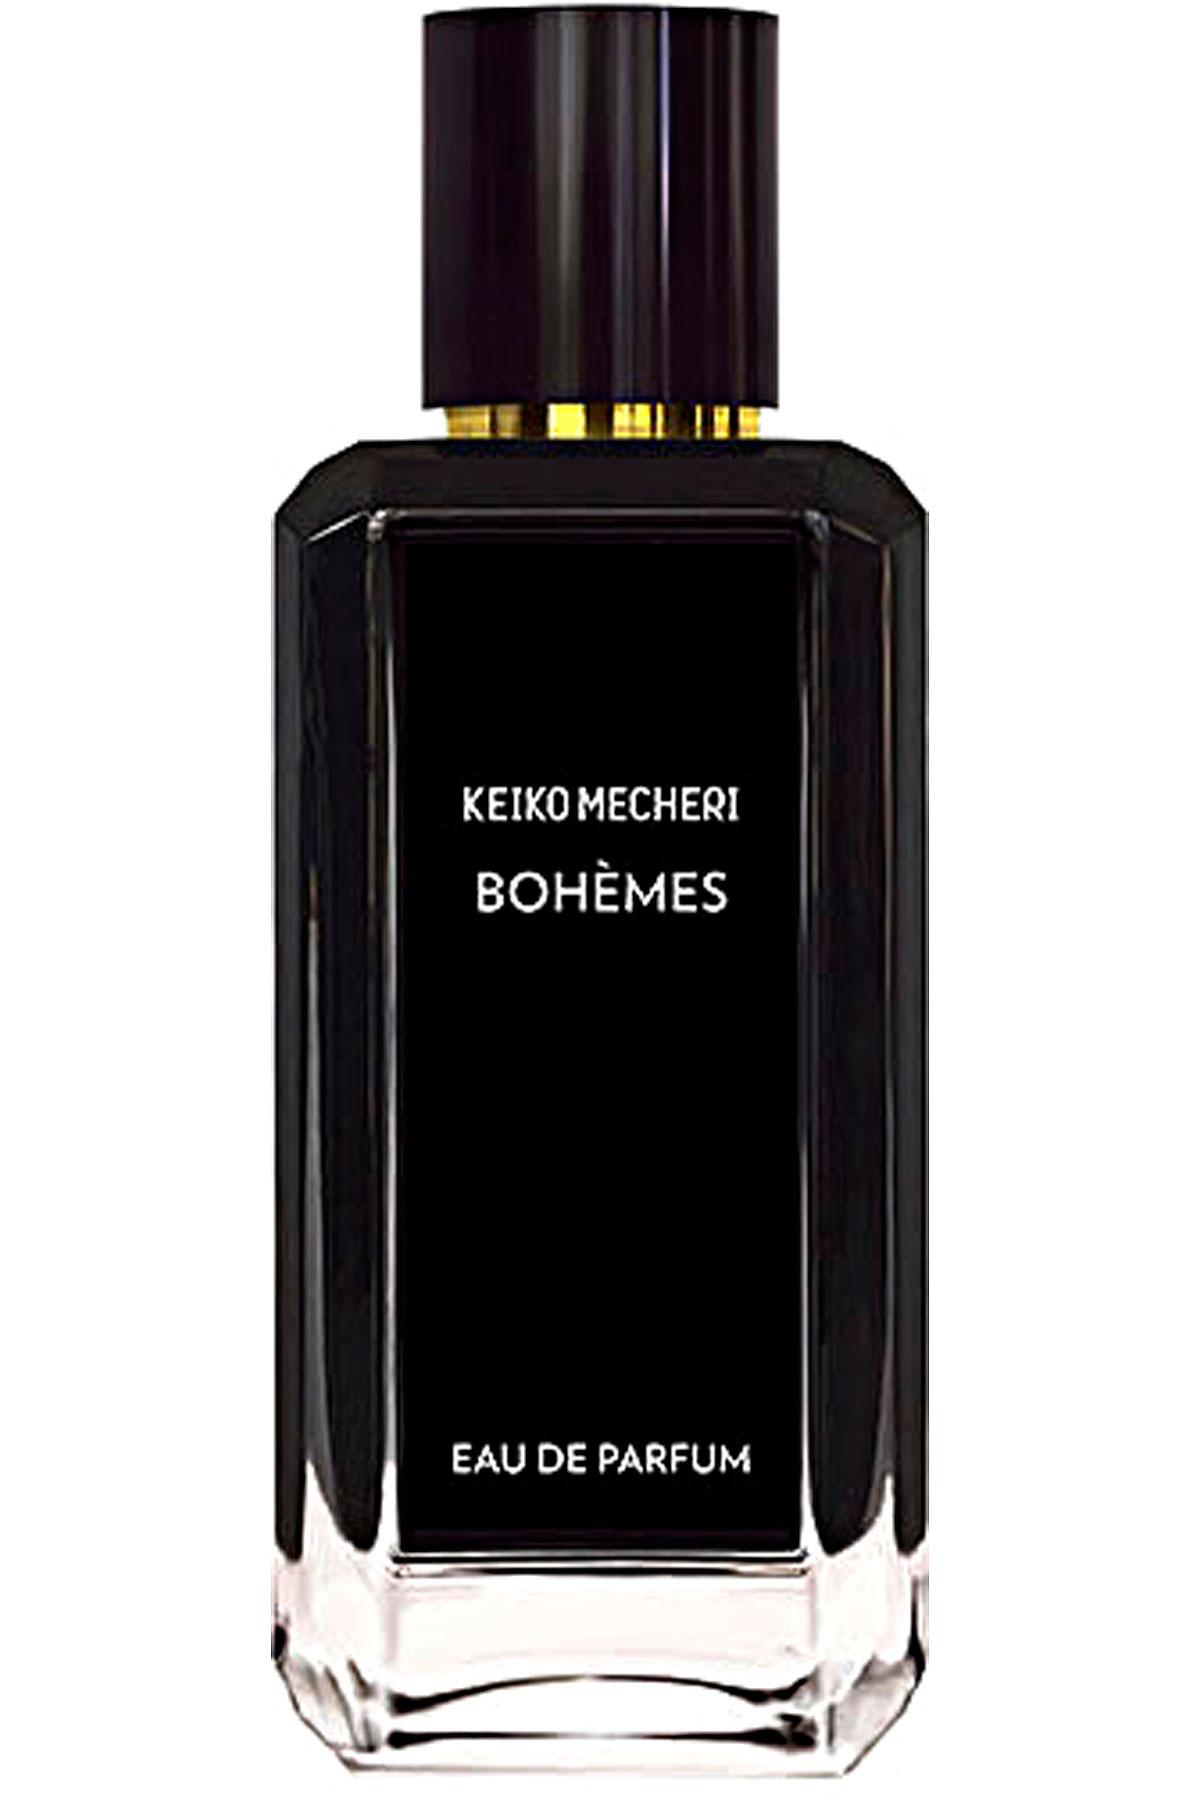 Keiko Mecheri Fragrances for Men, Bohemes - Eau De Parfum - 100 Ml, 2019, 100 ml